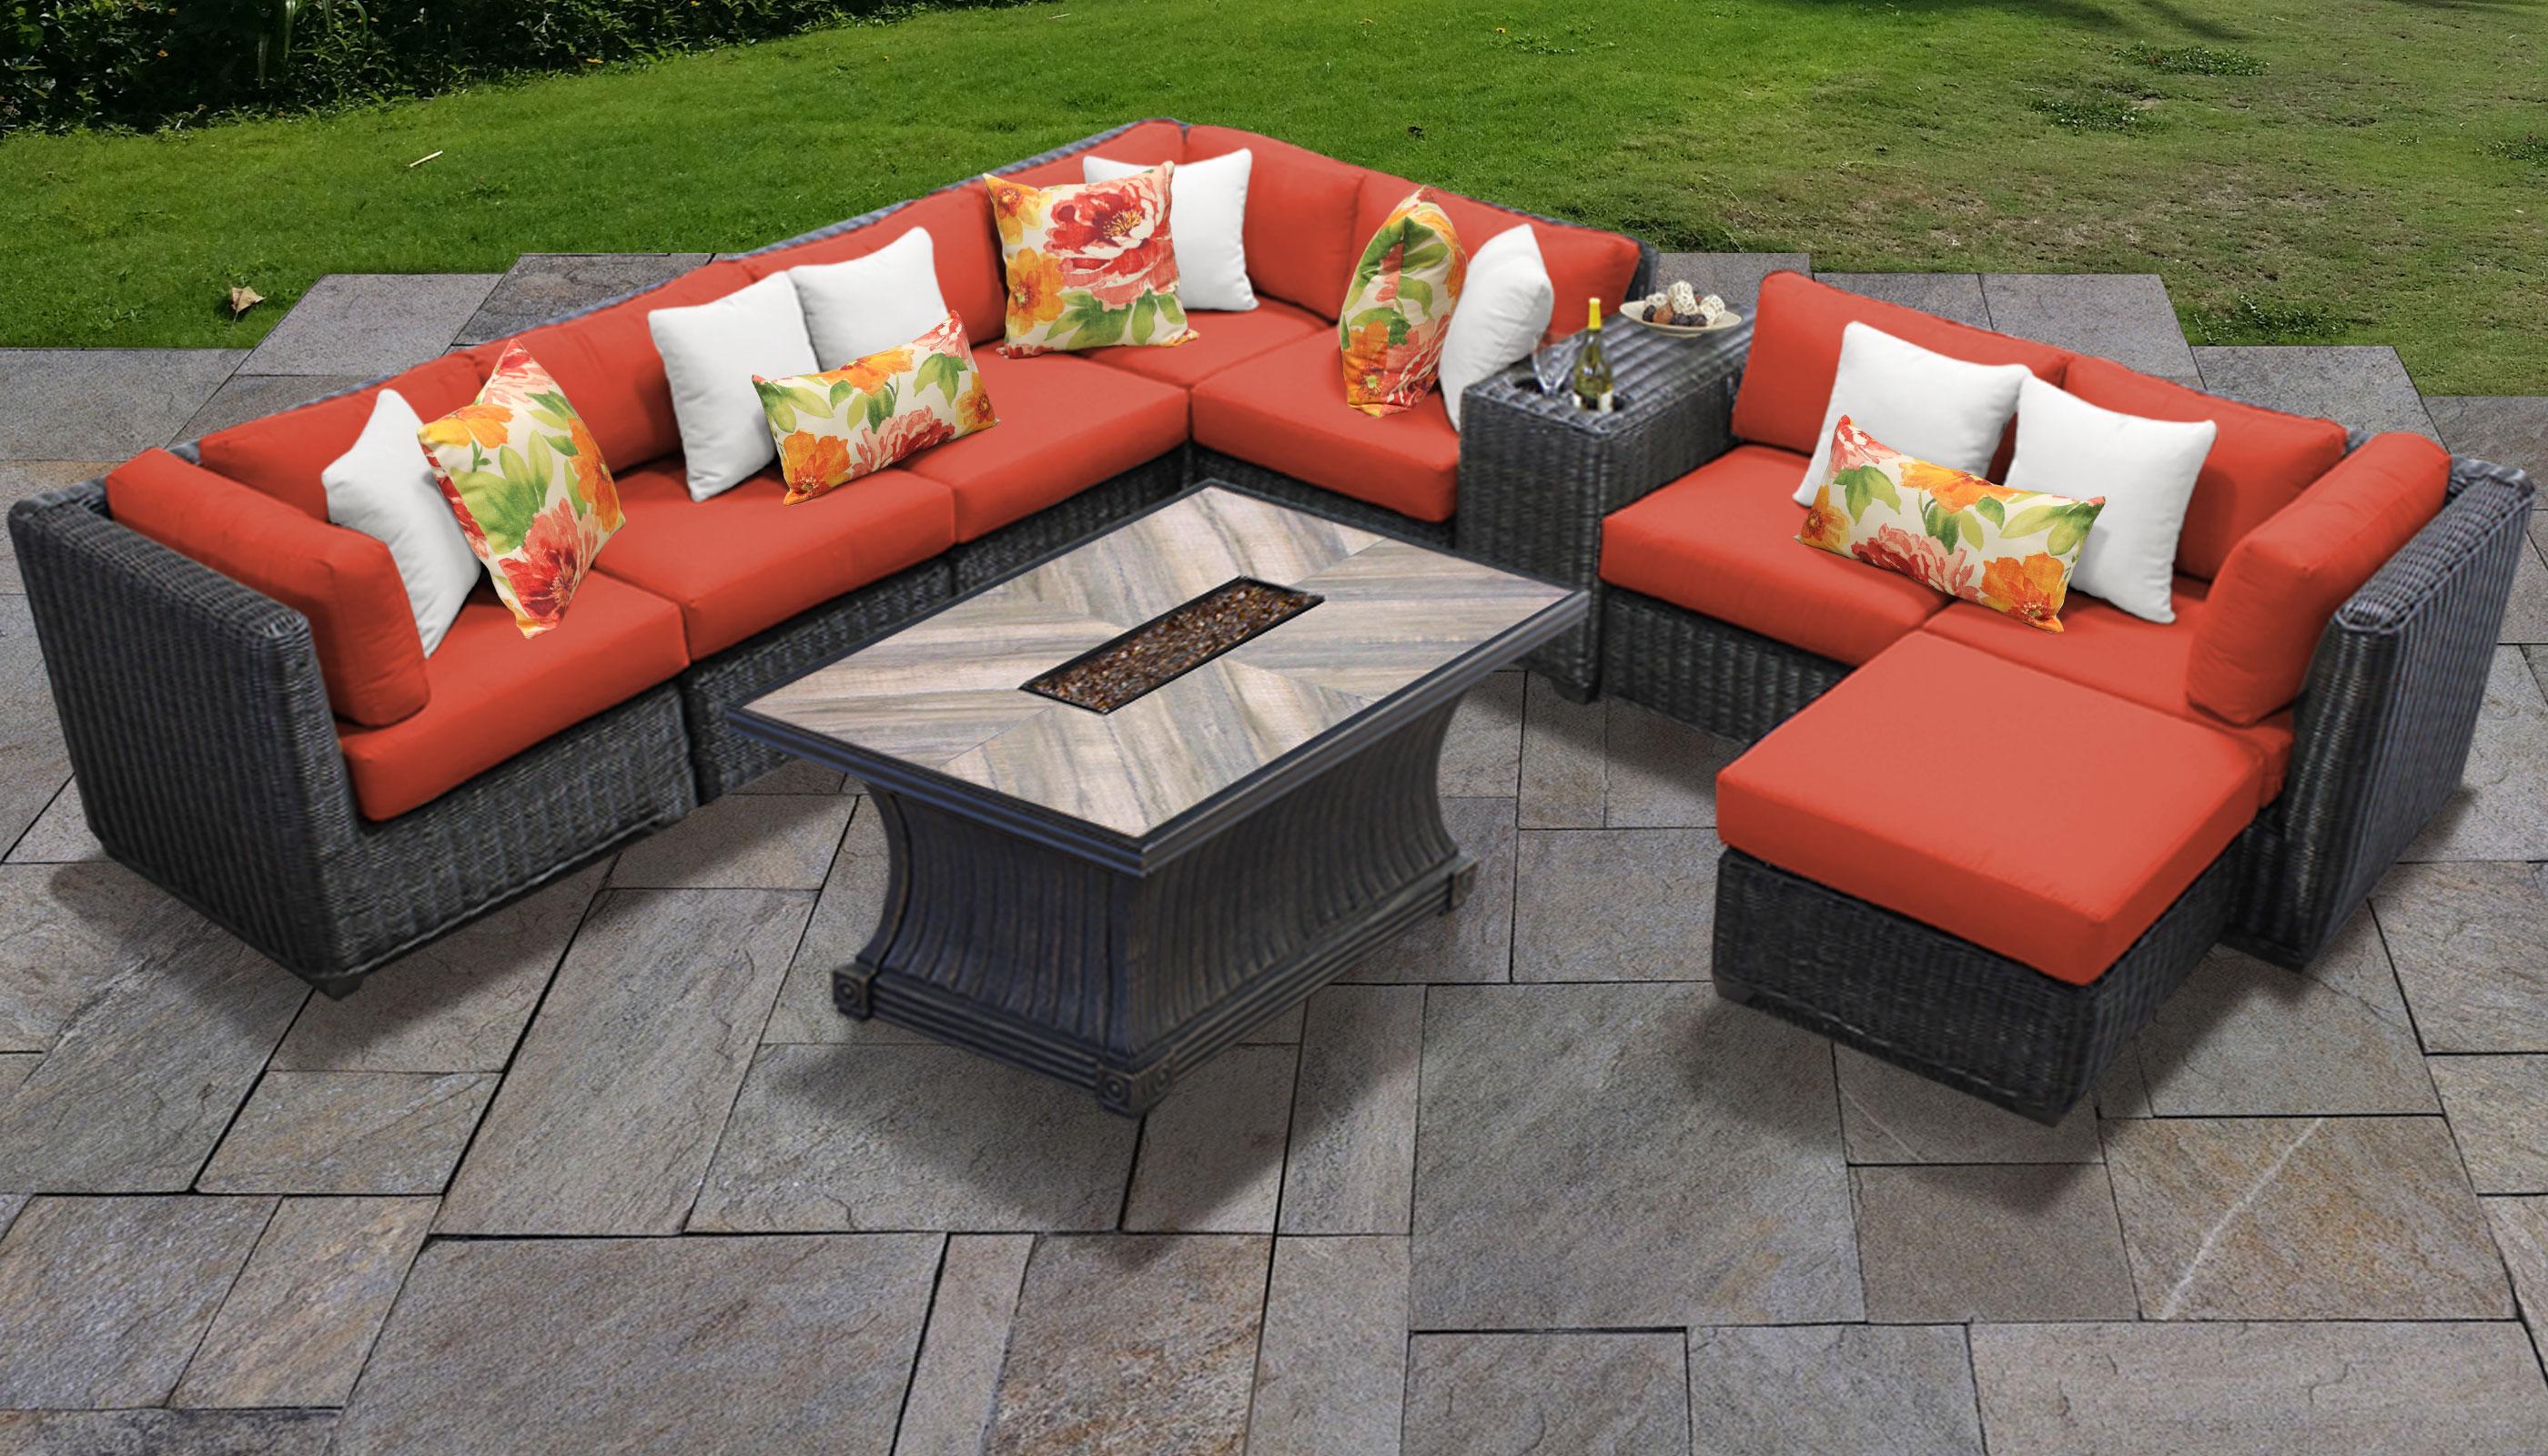 Tangerine Venice 10 Piece Outdoor Wicker Patio Furniture Set 10h Tk Clics